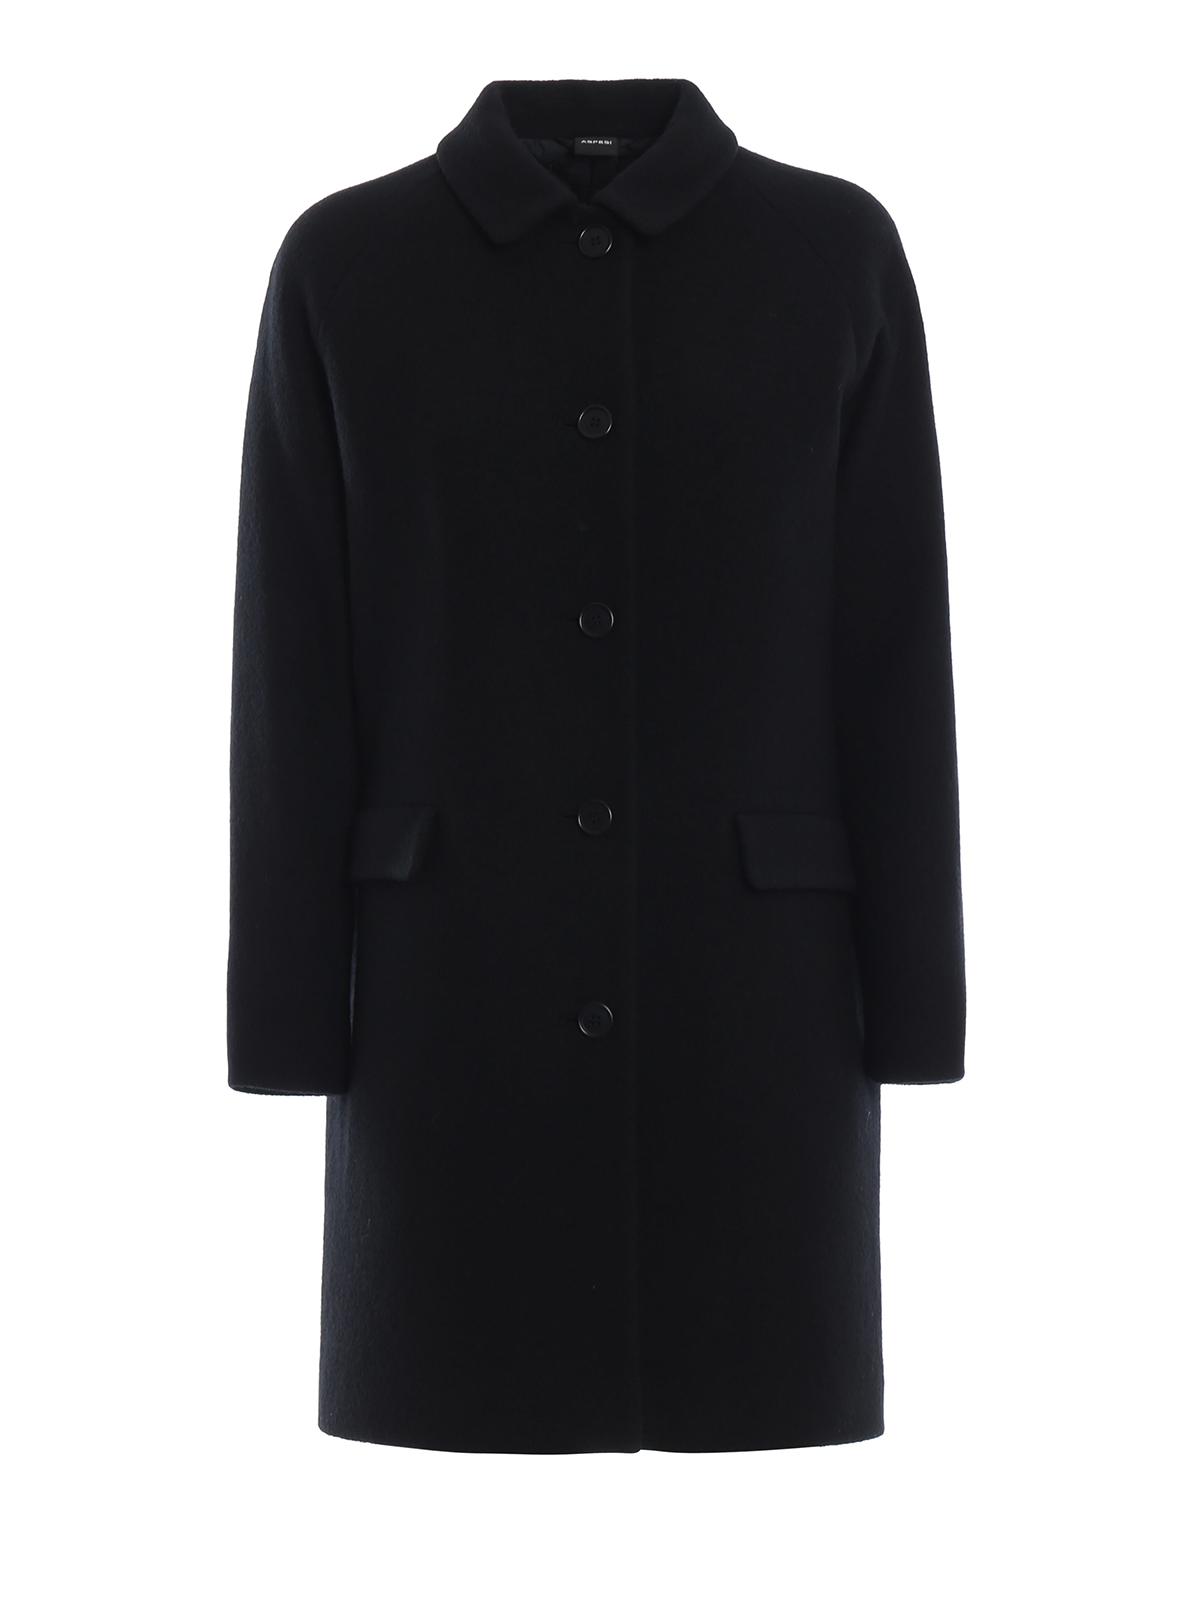 a4eb247c8 aspesi-short-coats-single-breasted-black-wool-cocoon-coat-00000138053f00s001.jpg